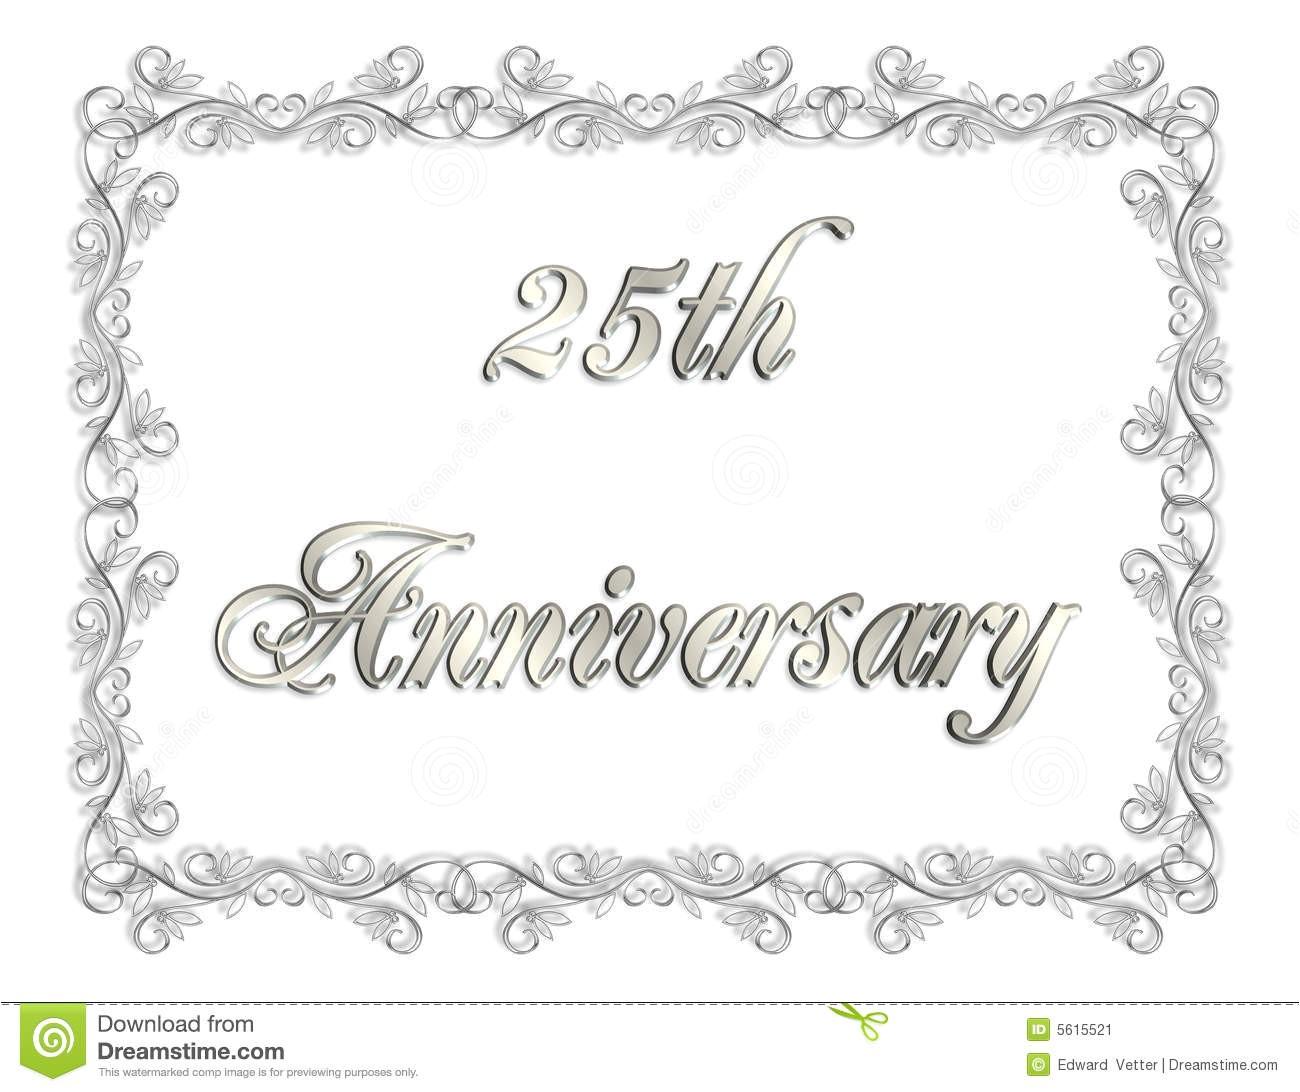 stock image 25th anniversary invitation 3d illustration image5615521